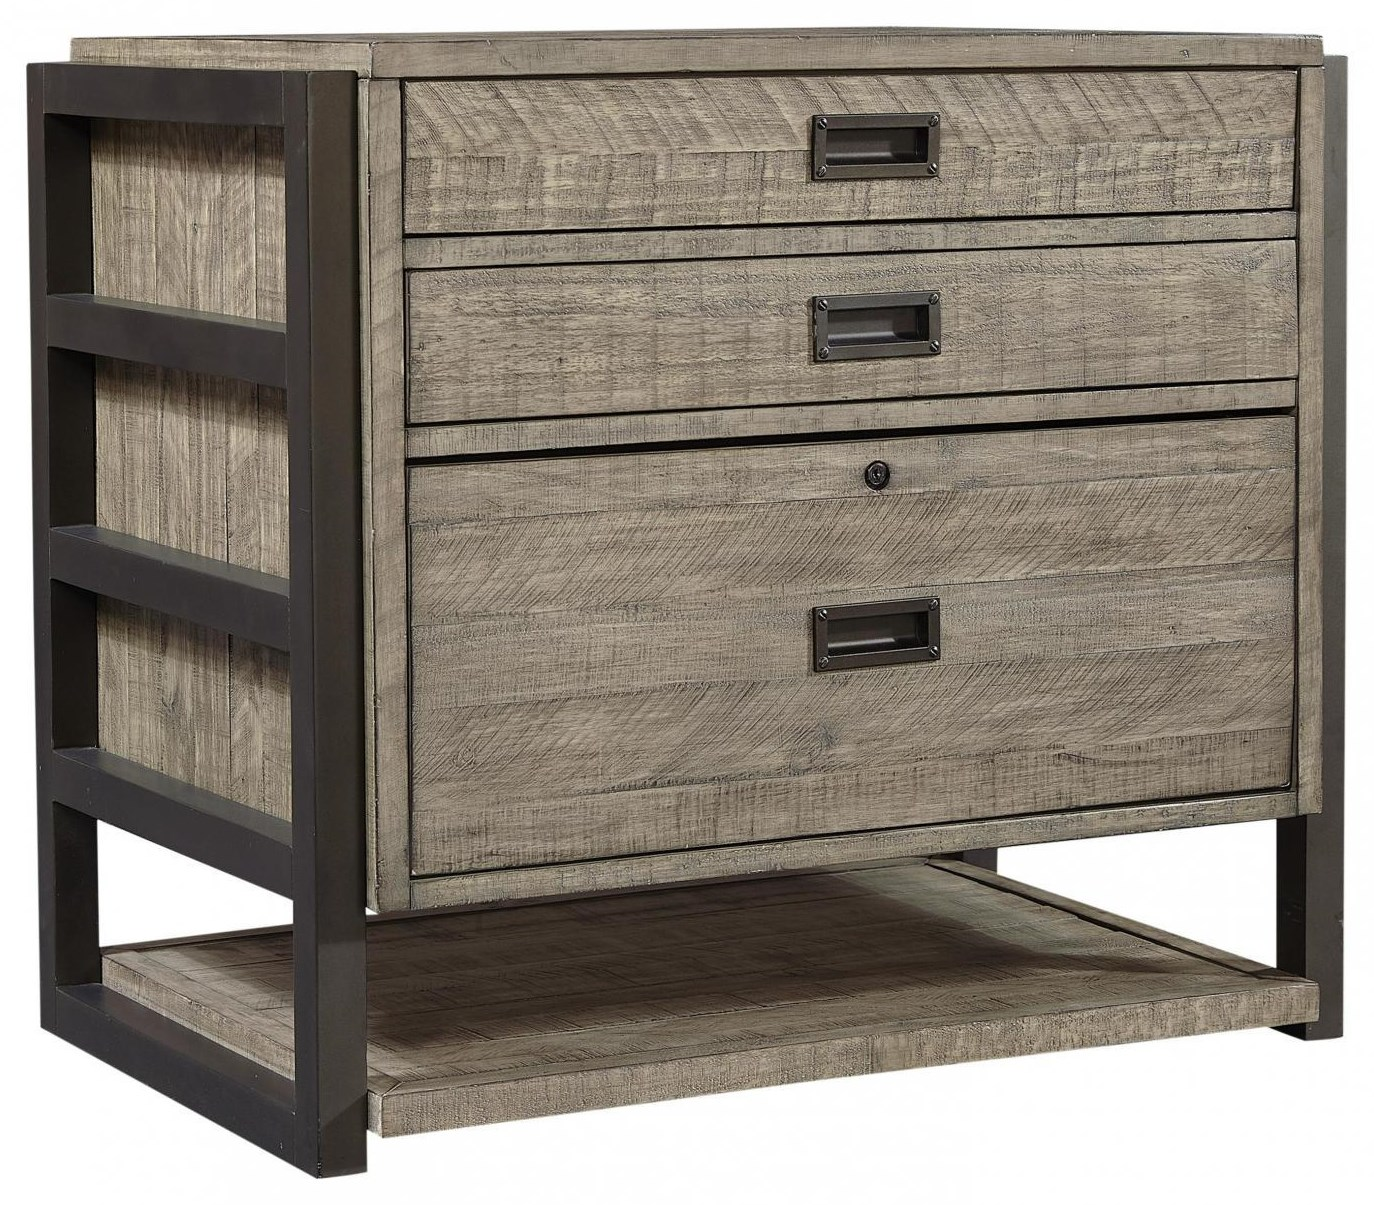 I215 Grayson Rustic File Cabinet by Aspenhome at Furniture Fair - North Carolina